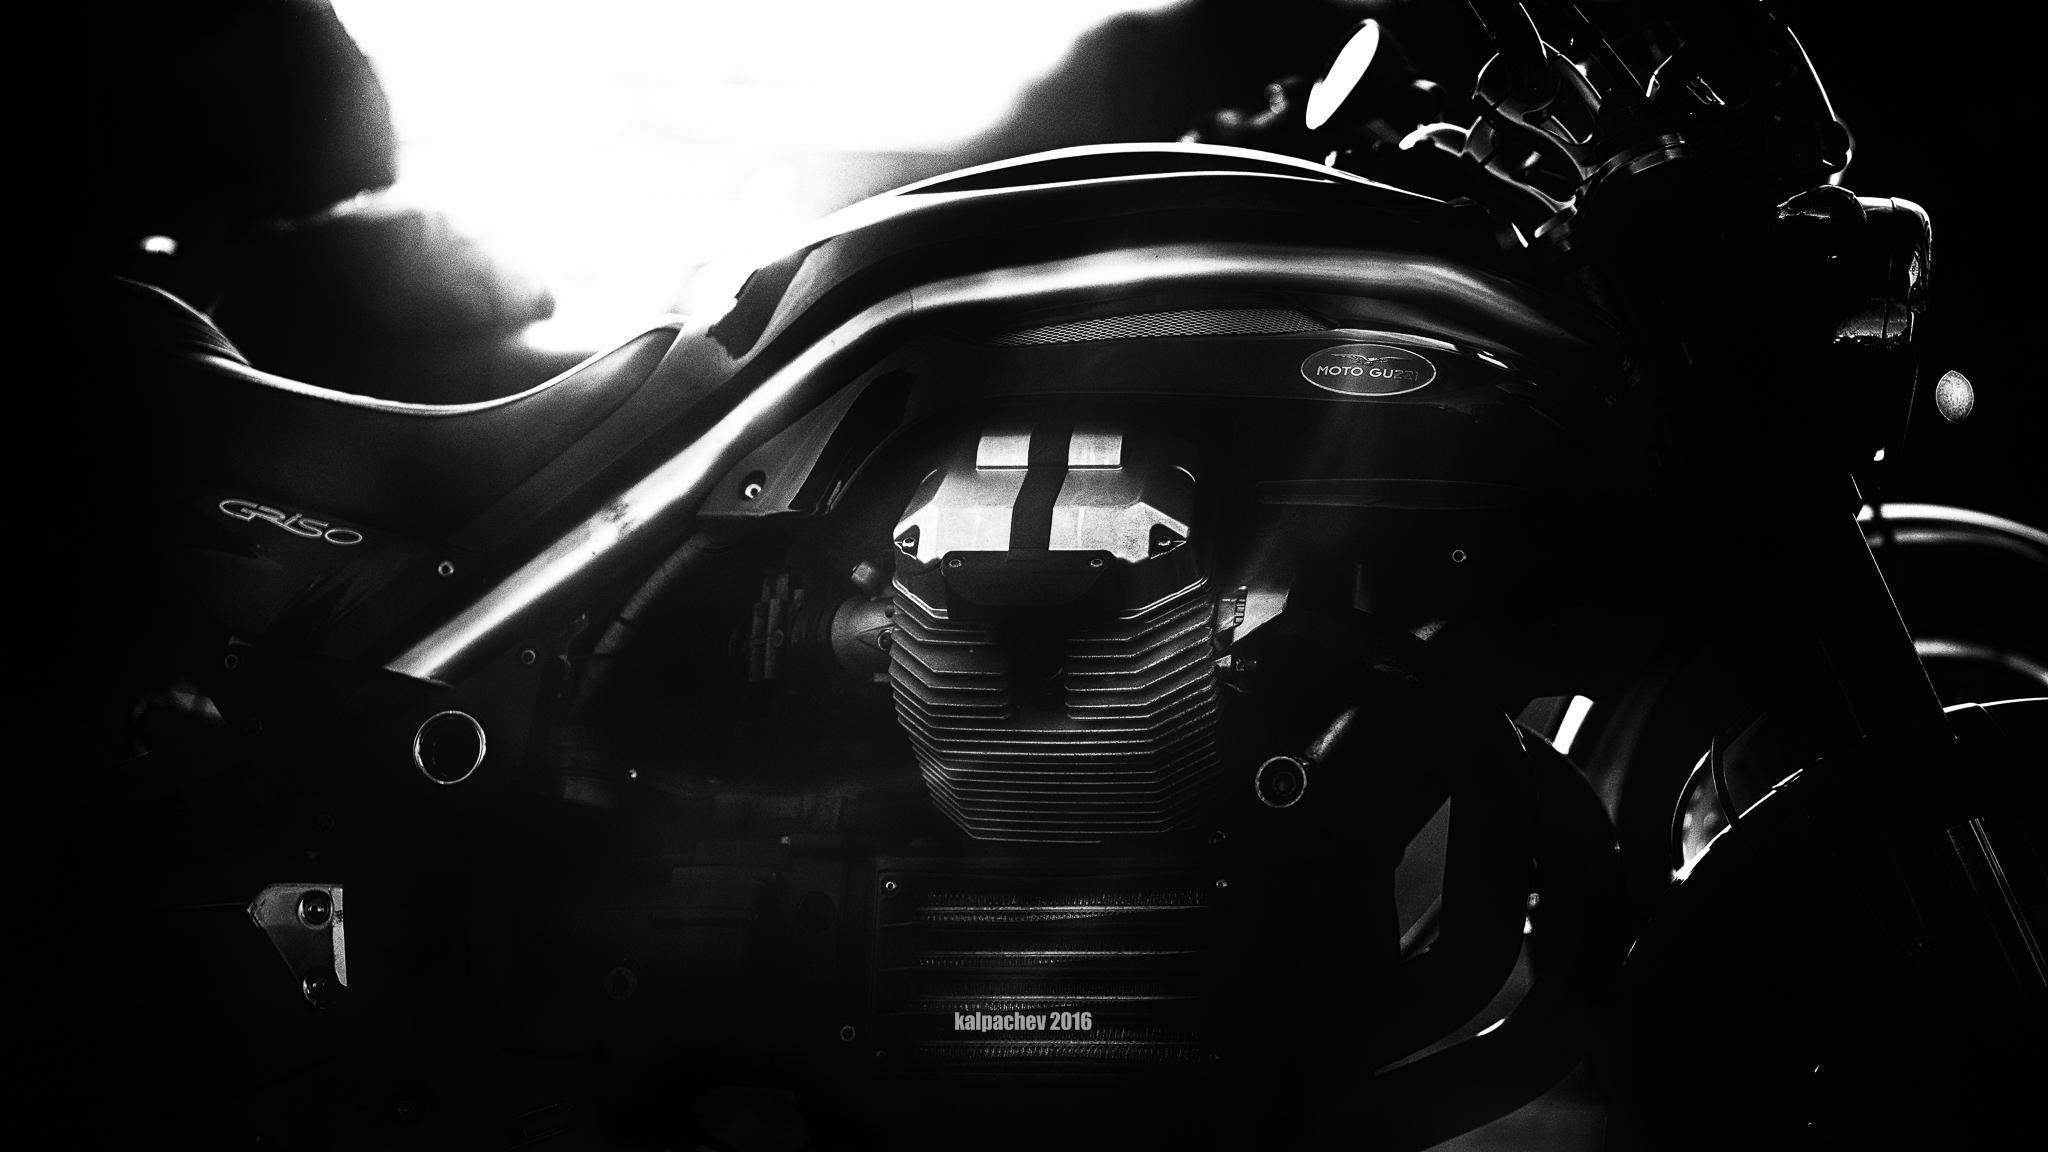 Moto Guzzi at Ace Cafe London